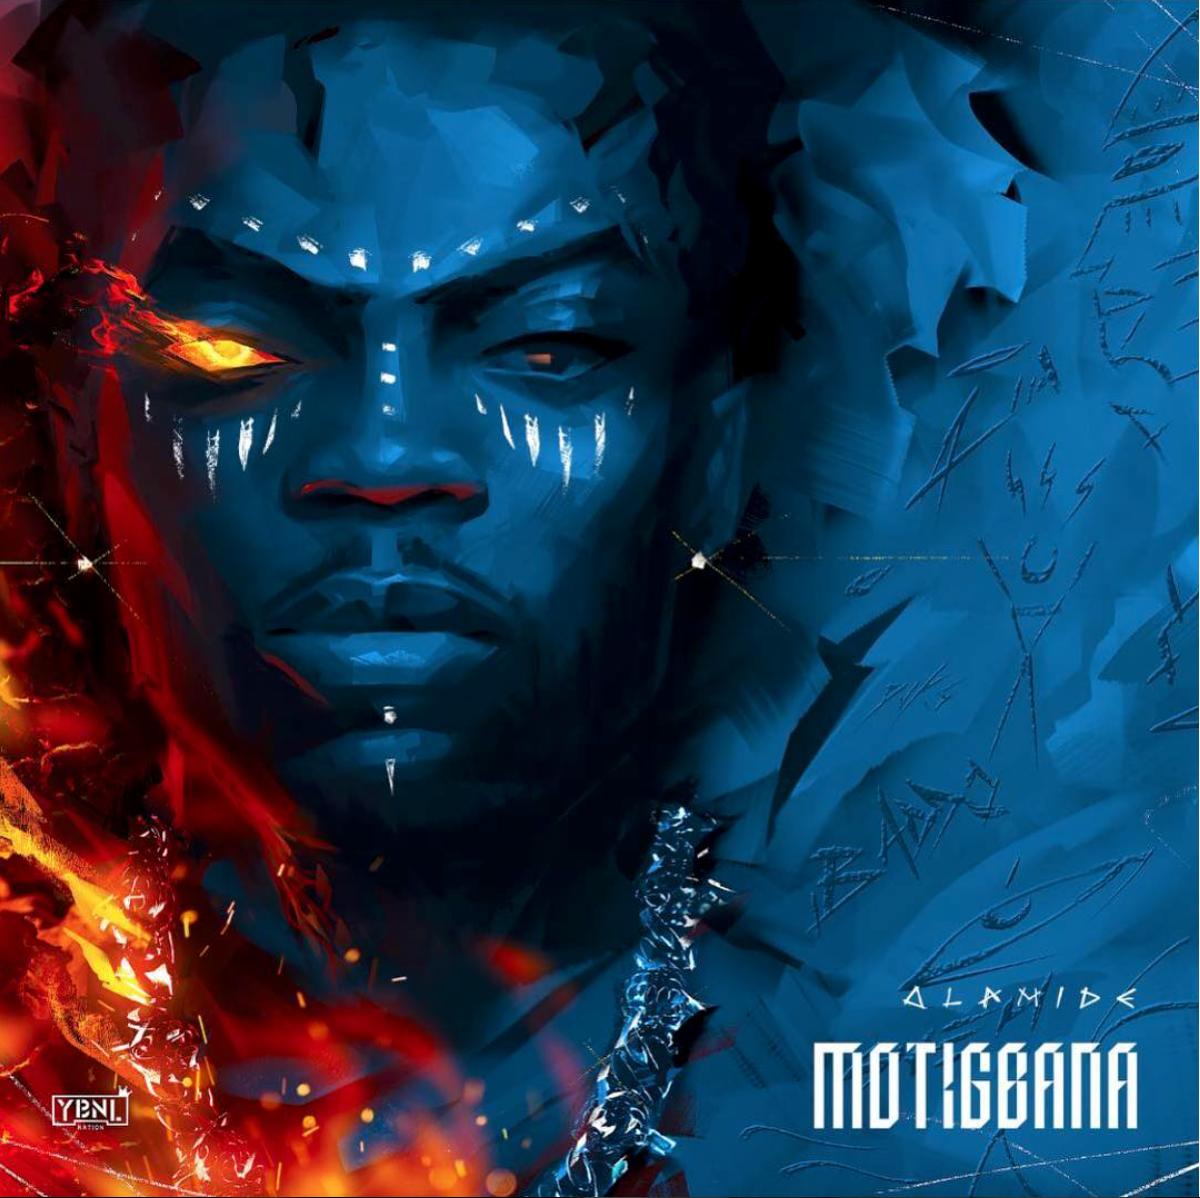 Olamide Motigbana Downlaod - Video & MP3 Download Of Motigbana